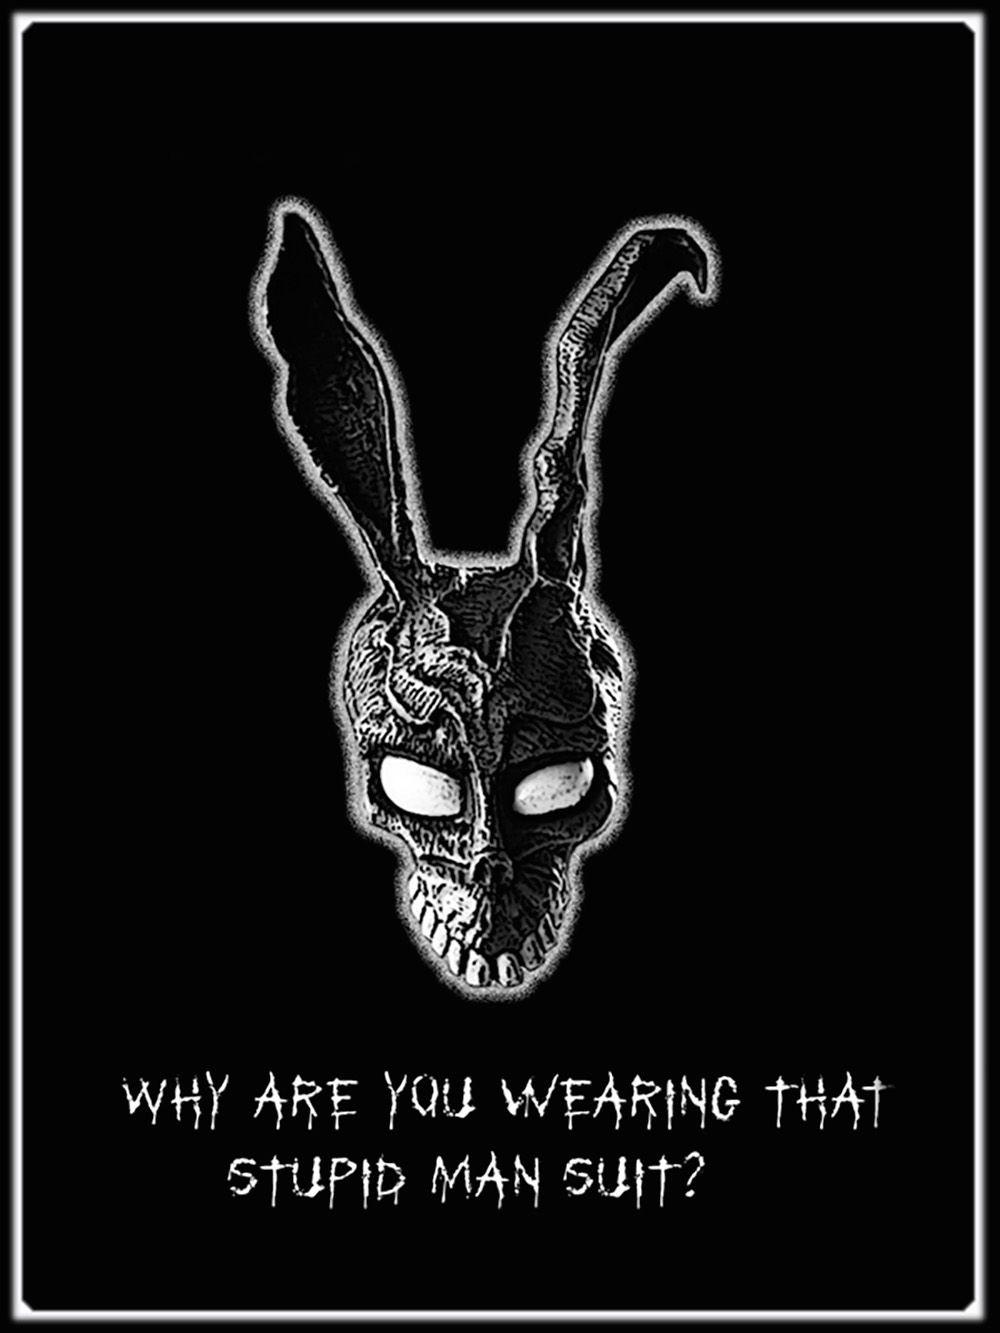 Happy Easter! (Donnie Darko)